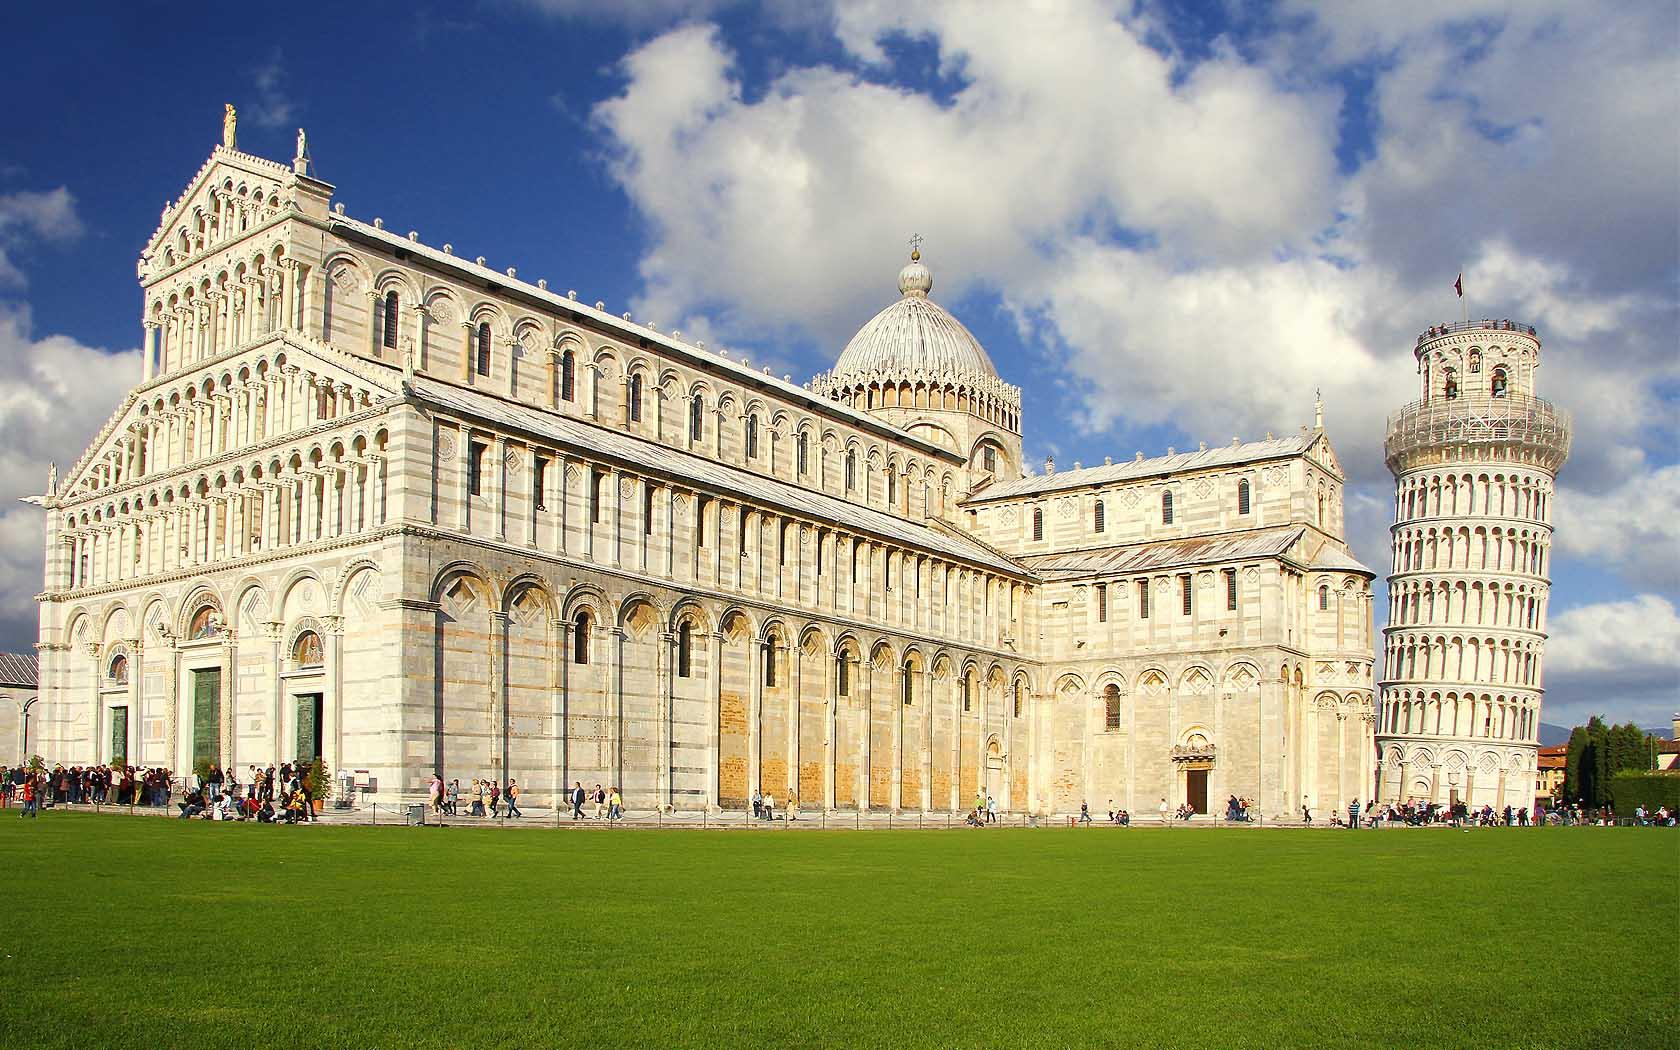 Voli per Pisa (Toscana) a partire da 39, 99 39, 99